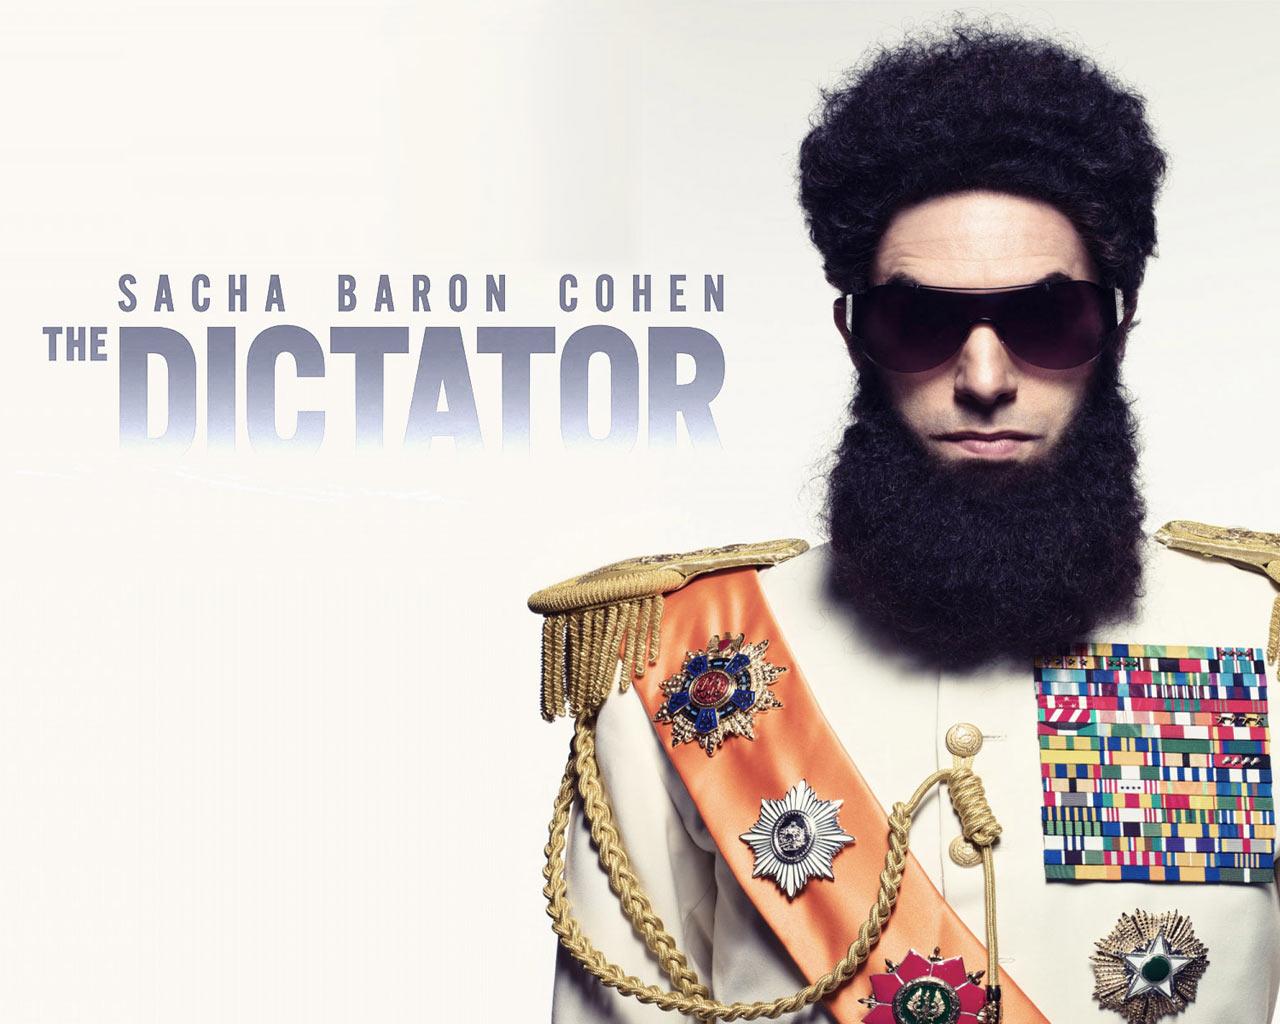 The Dictator wallpaper 4